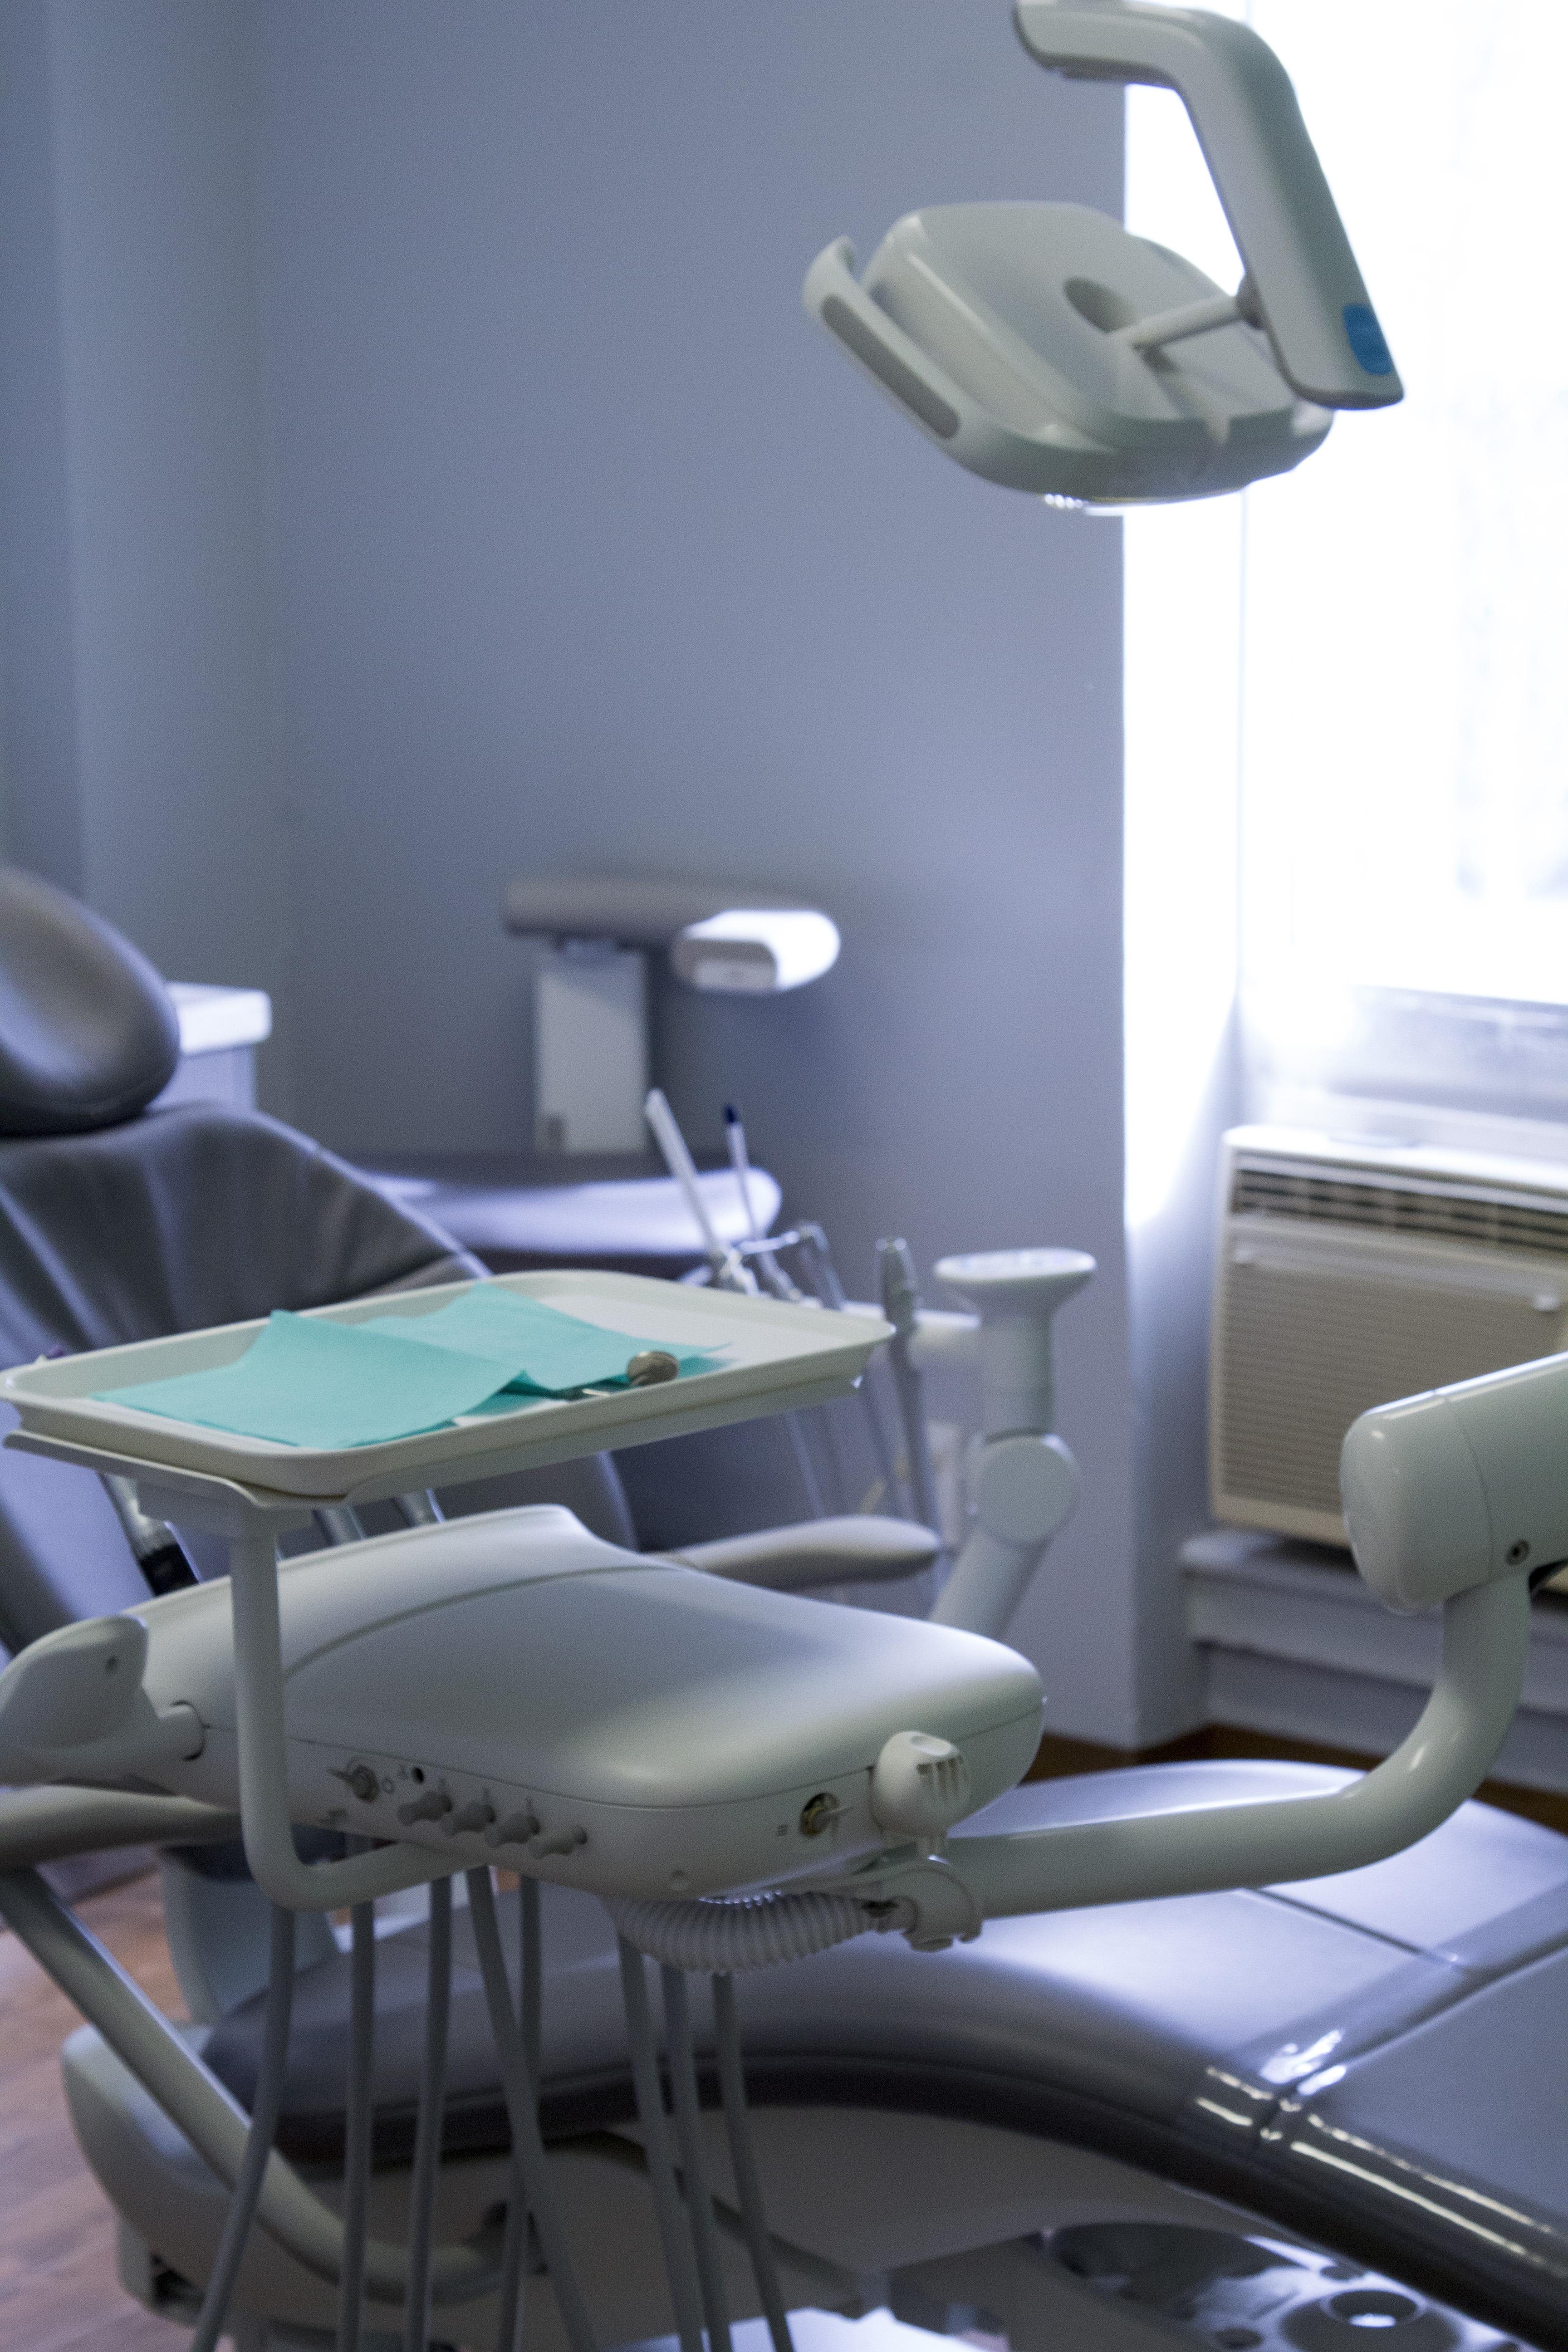 Pediatric dental equipment